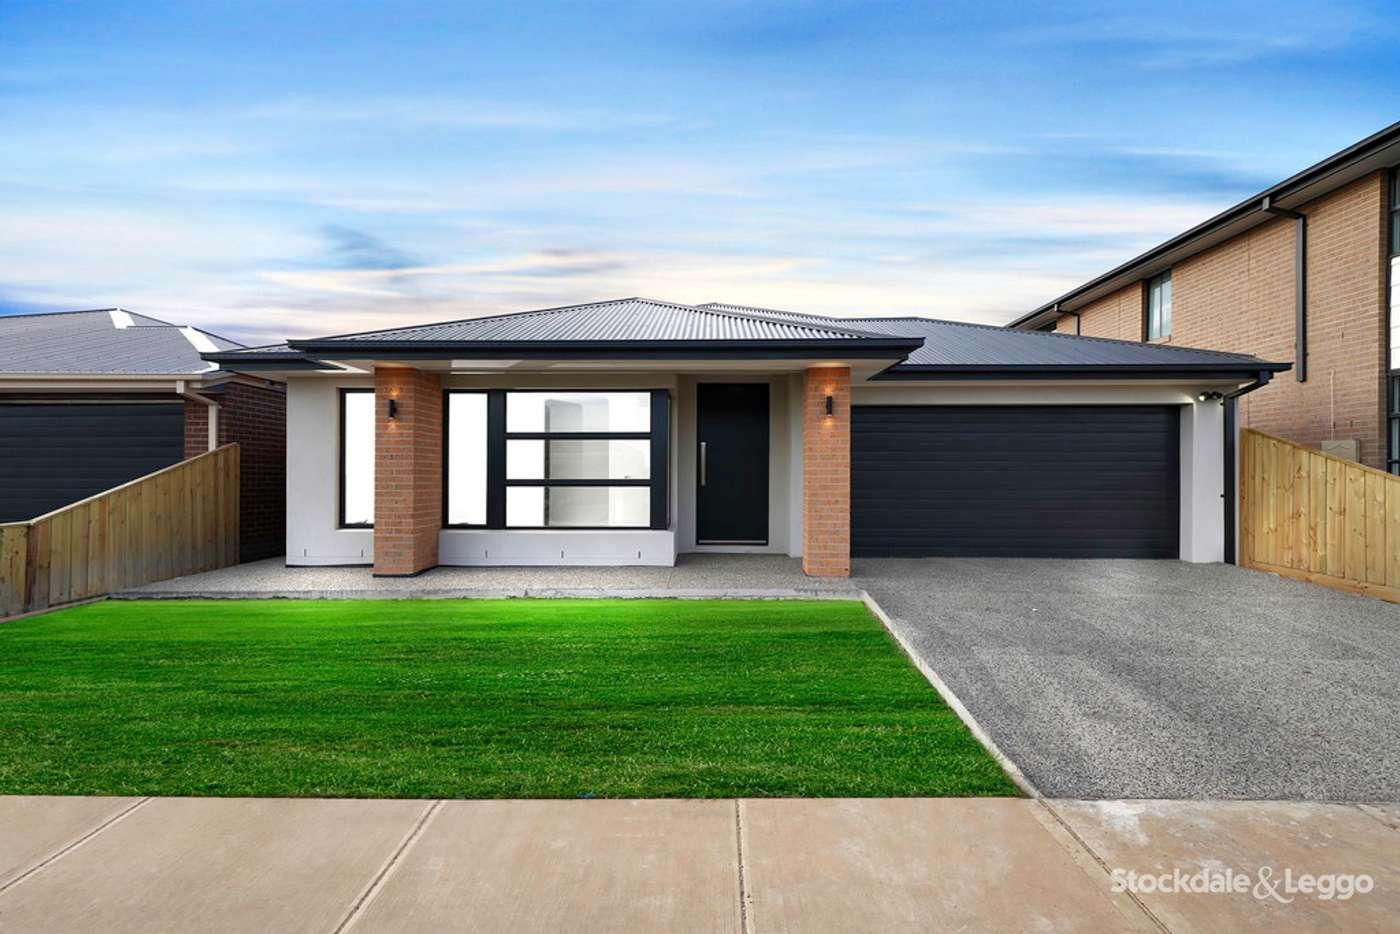 Main view of Homely house listing, 18 Mandrake Street, Tarneit VIC 3029